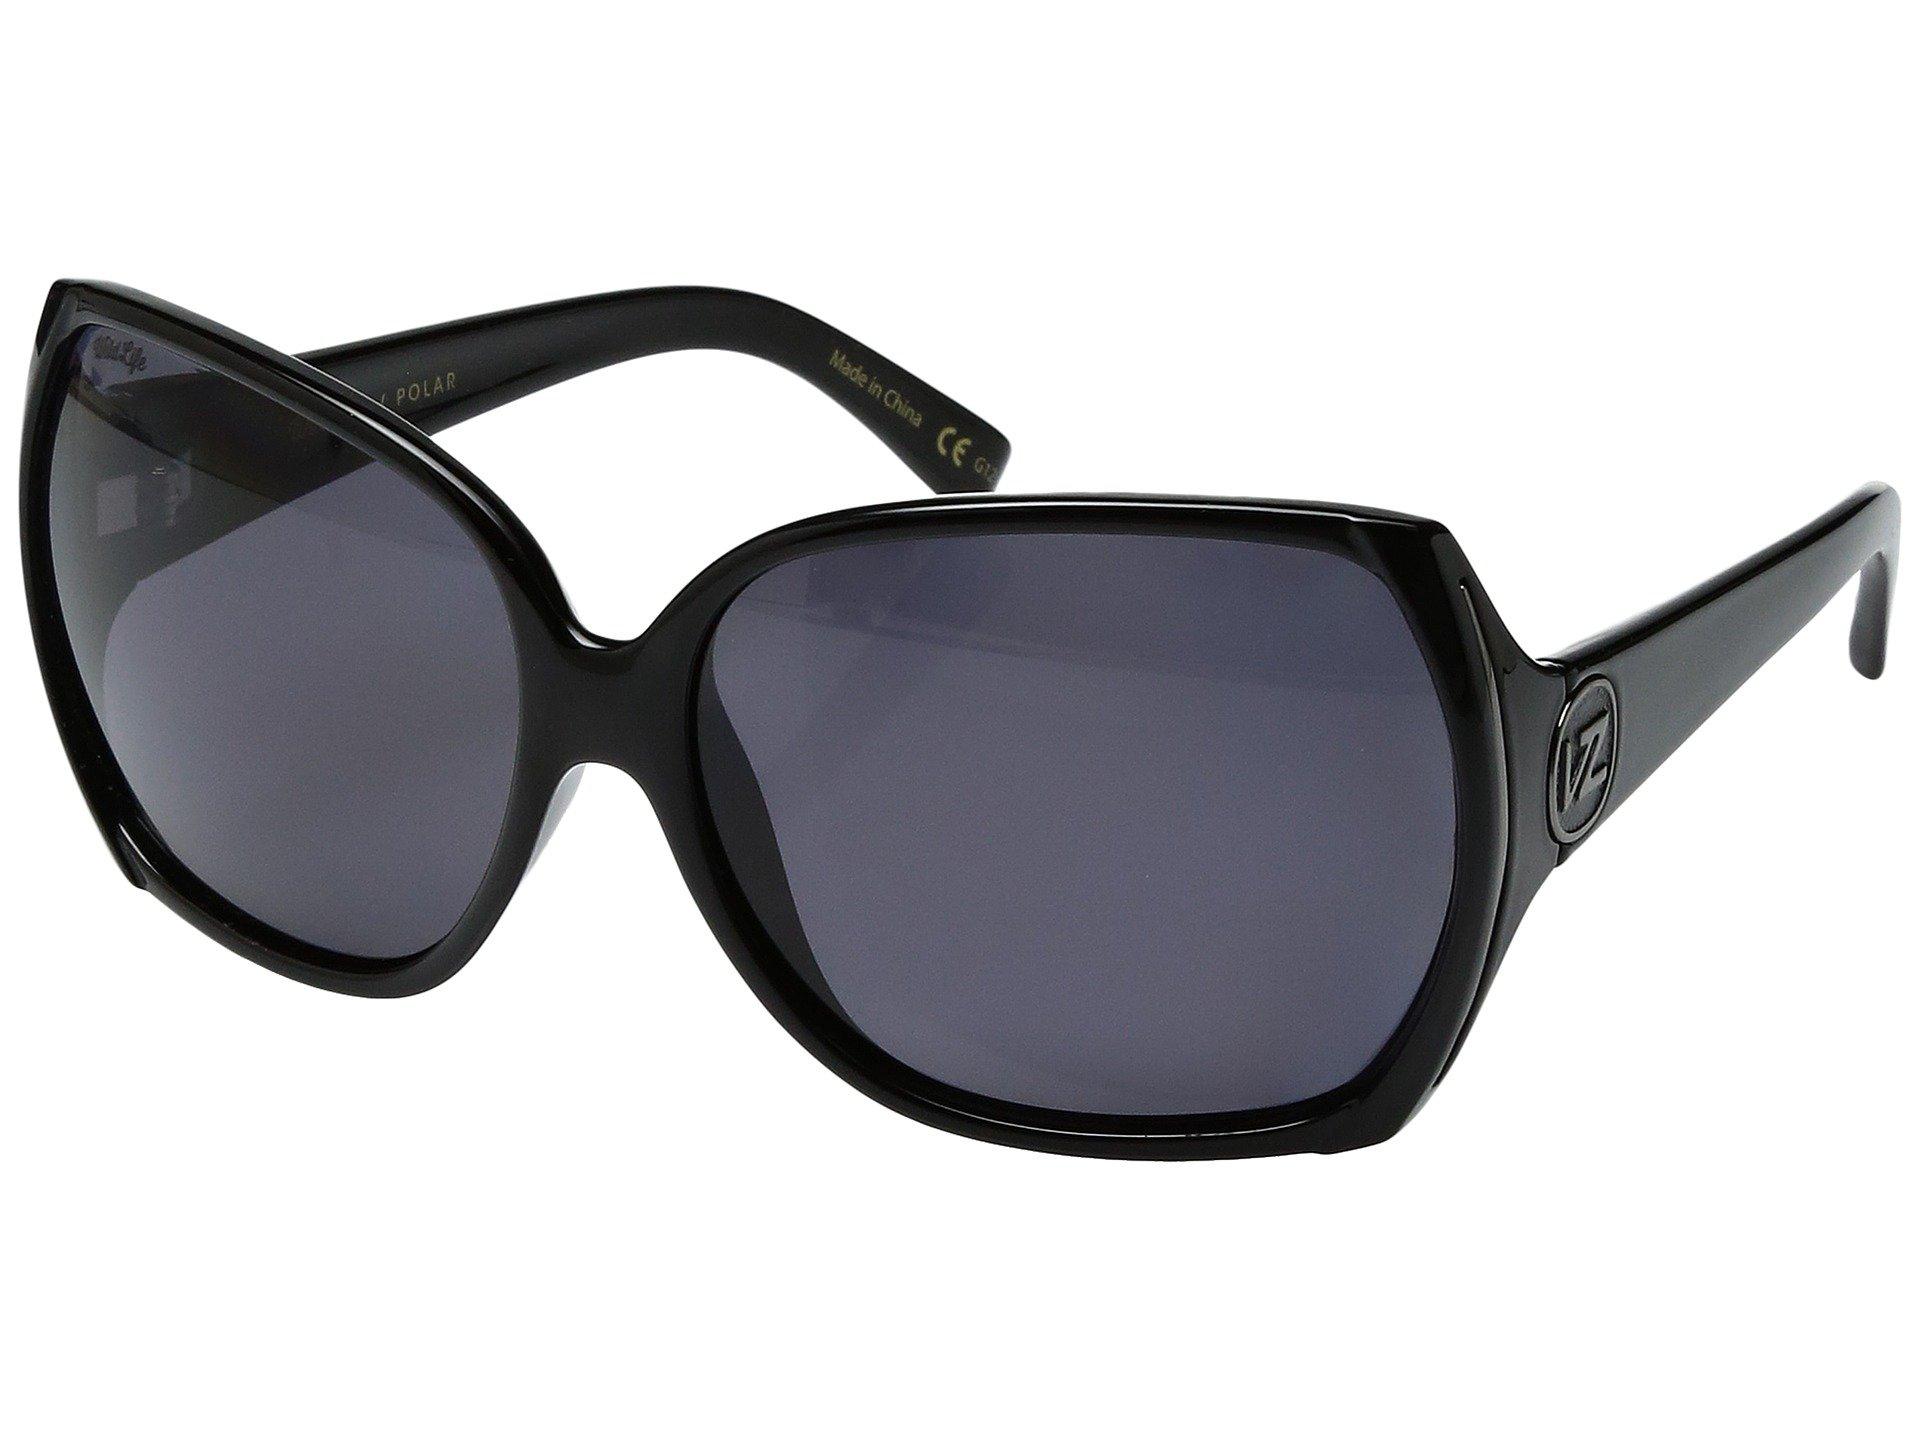 40b0bfb273e Women s VonZipper Eyewear + FREE SHIPPING